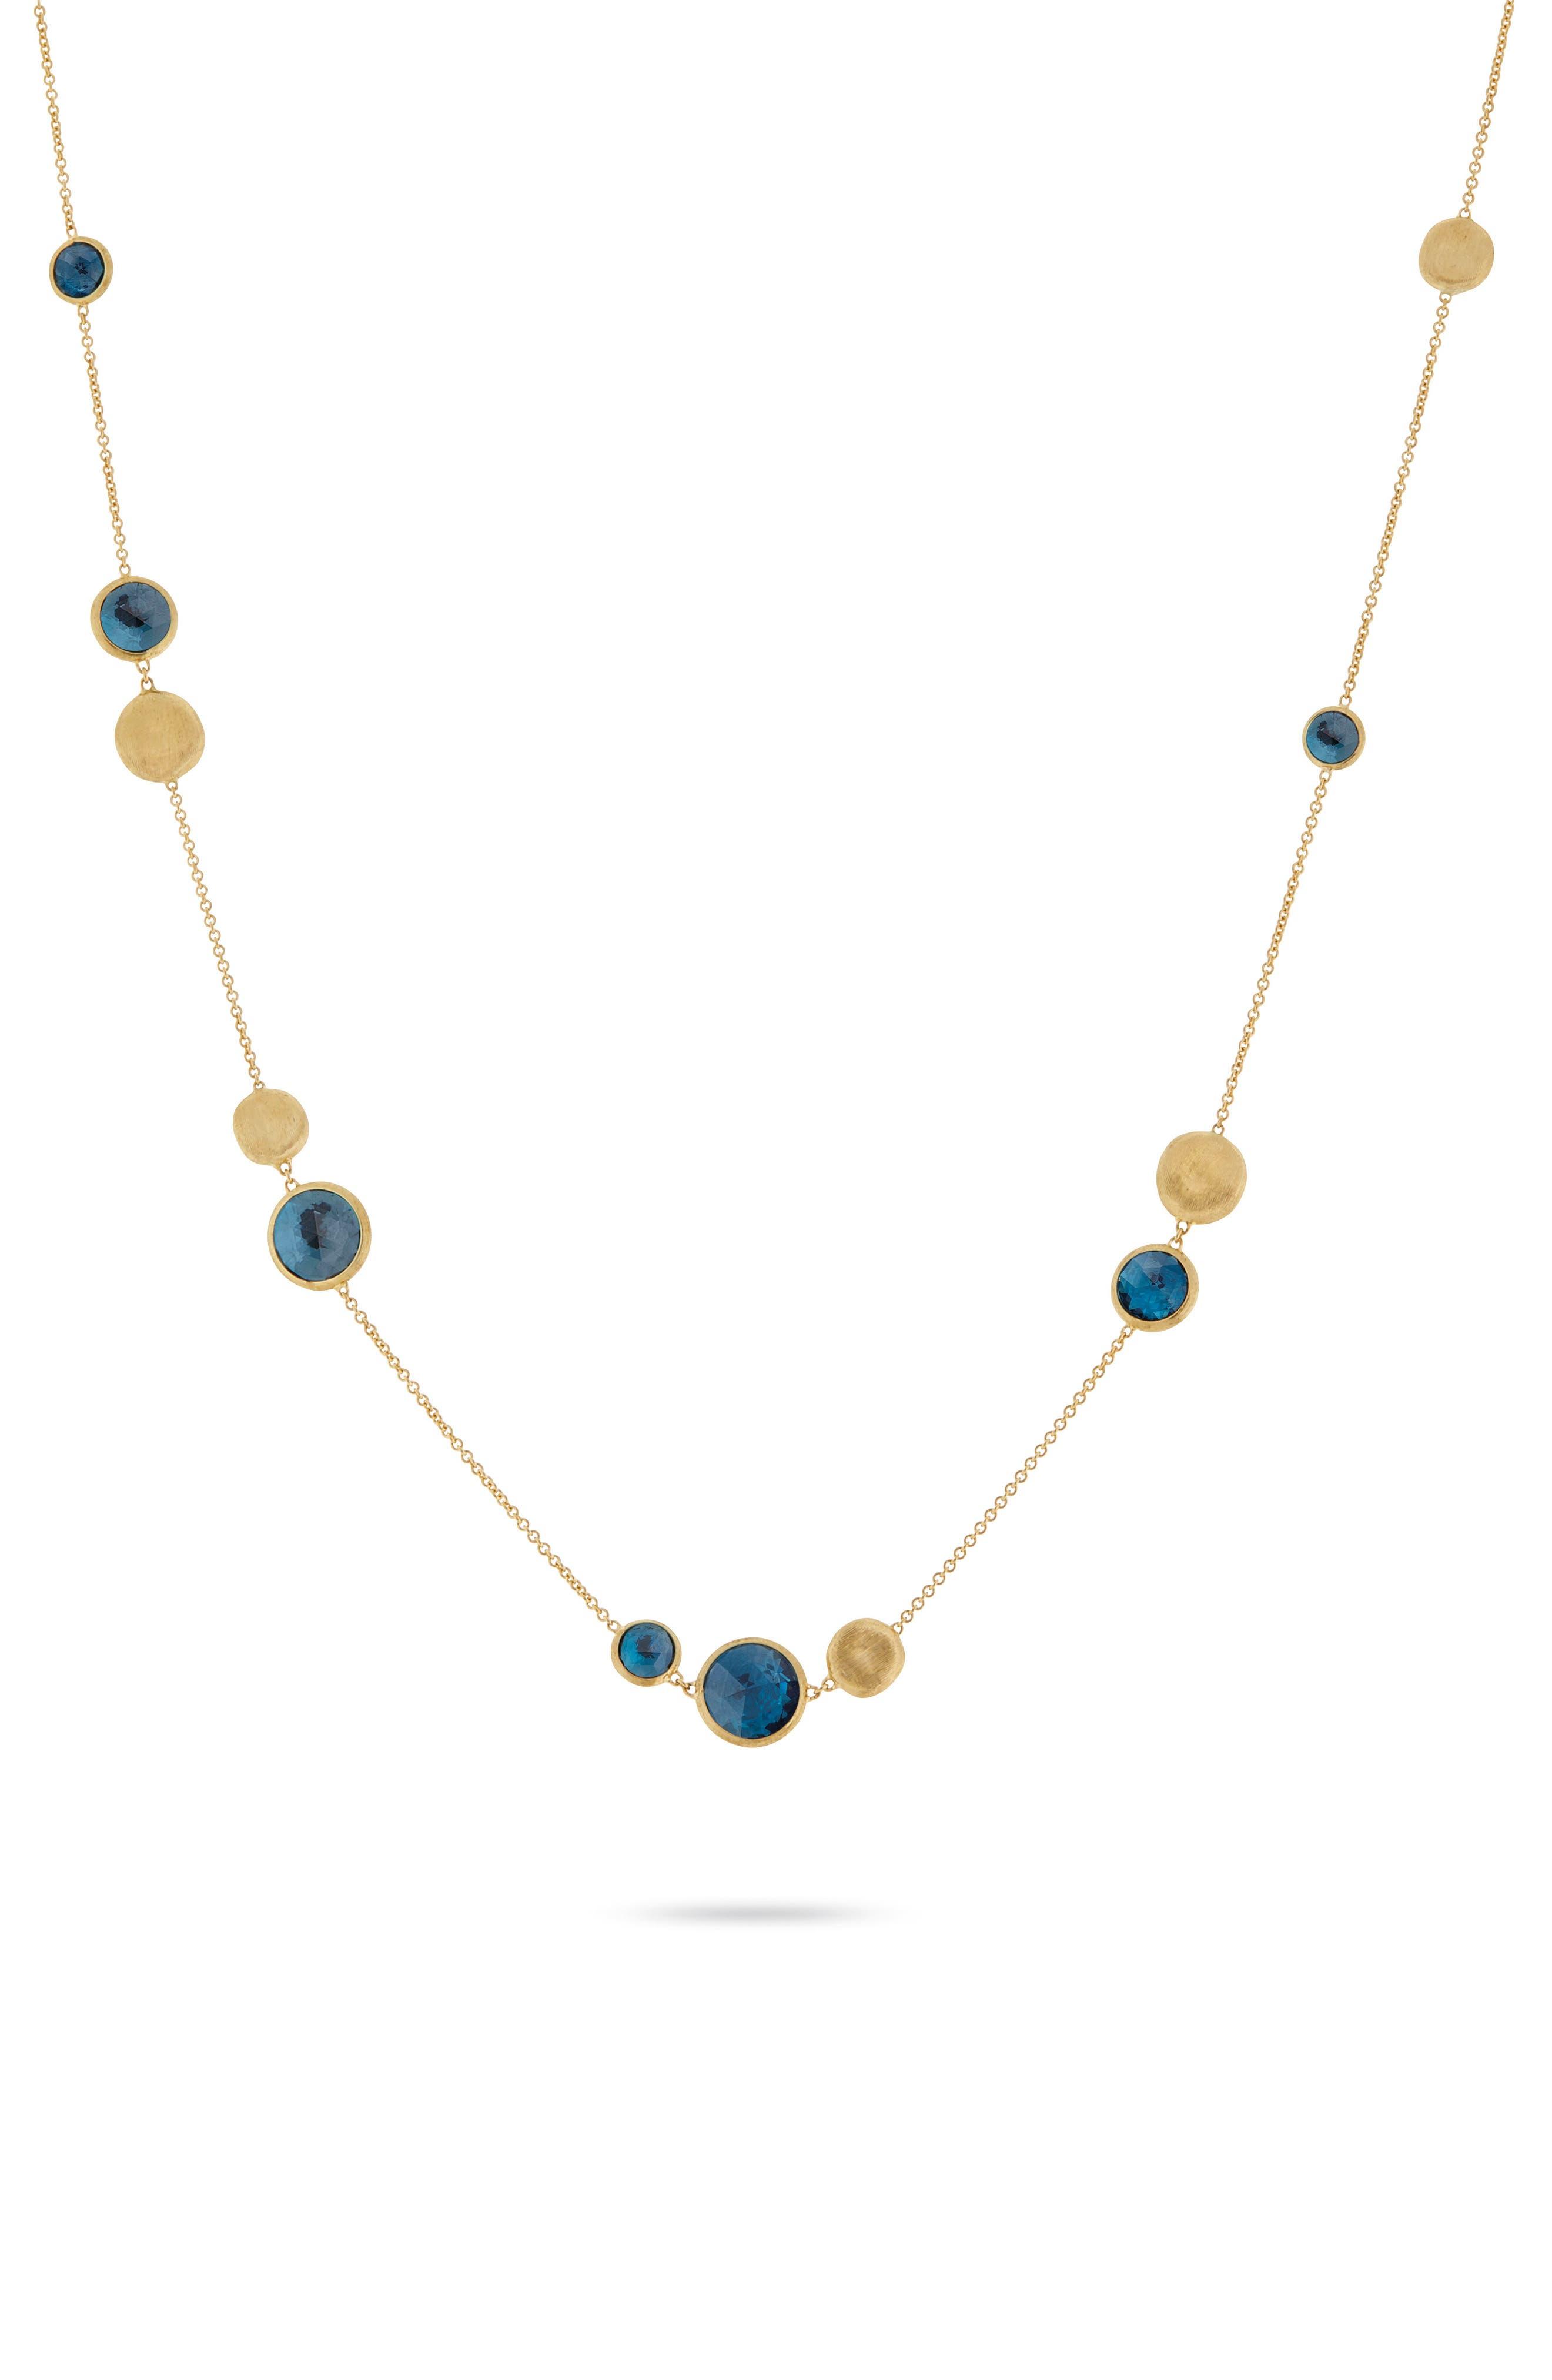 Marco Biecego Jaipur Semiprecious Stone Necklace,                         Main,                         color, YELLOW GOLD/ BLUE TOPAZ